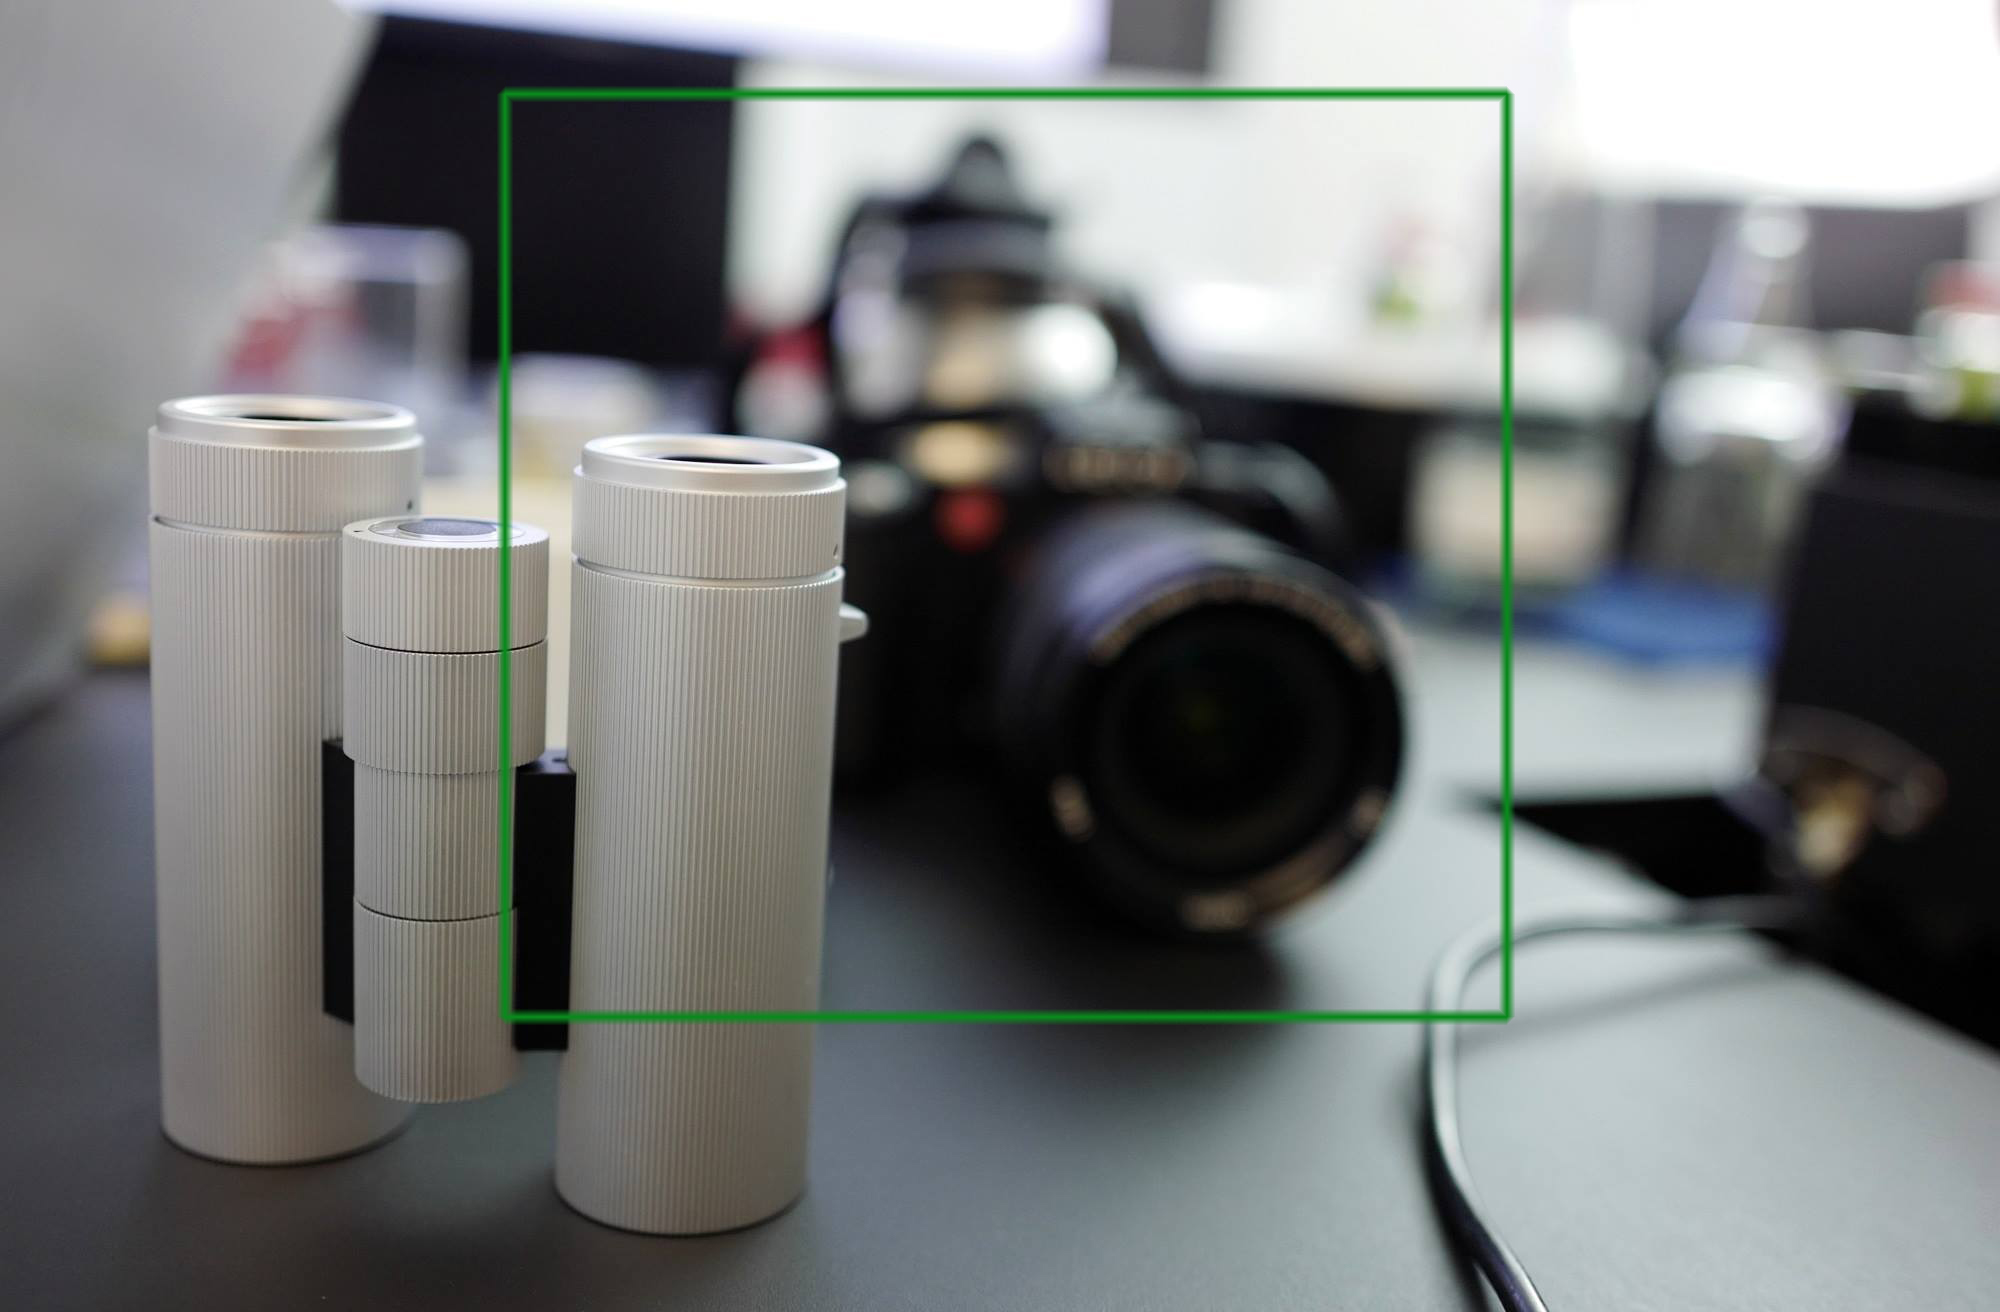 Leica Sl Camera: The Startup Edition eBook